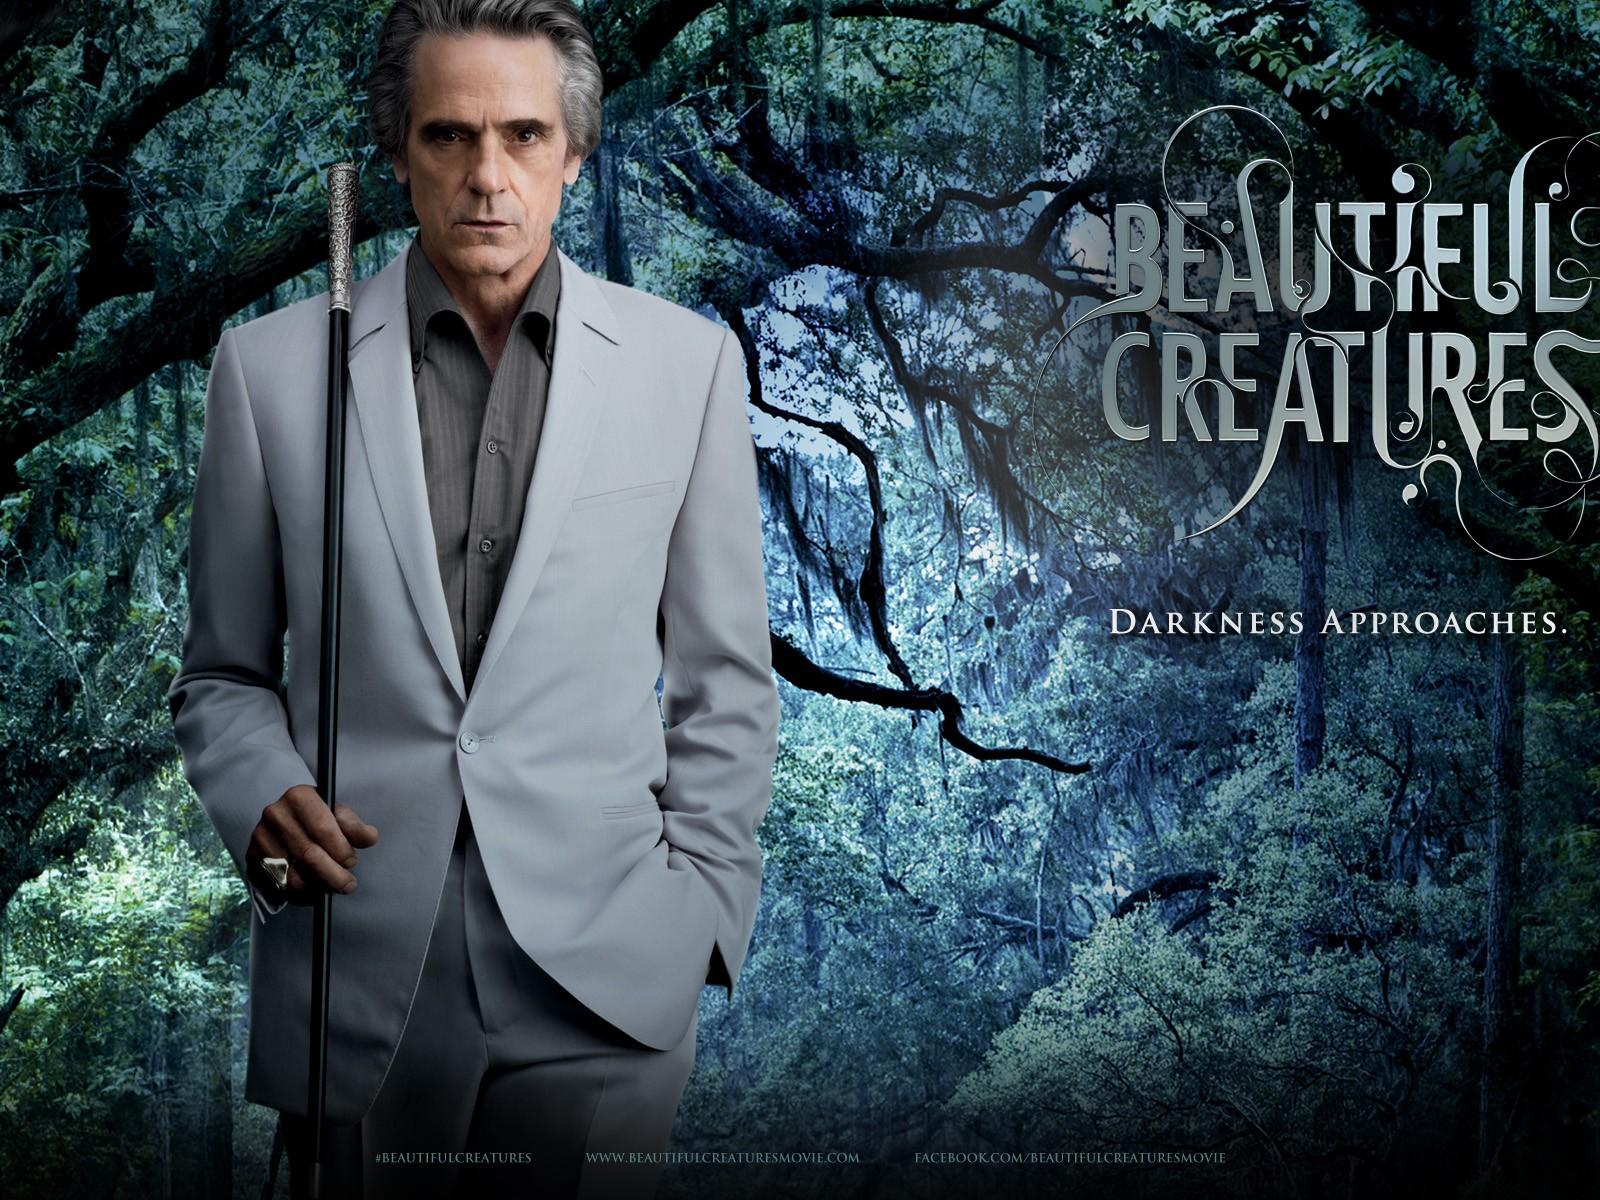 Sarafine Beautiful Creatures E sarafine duchannes.